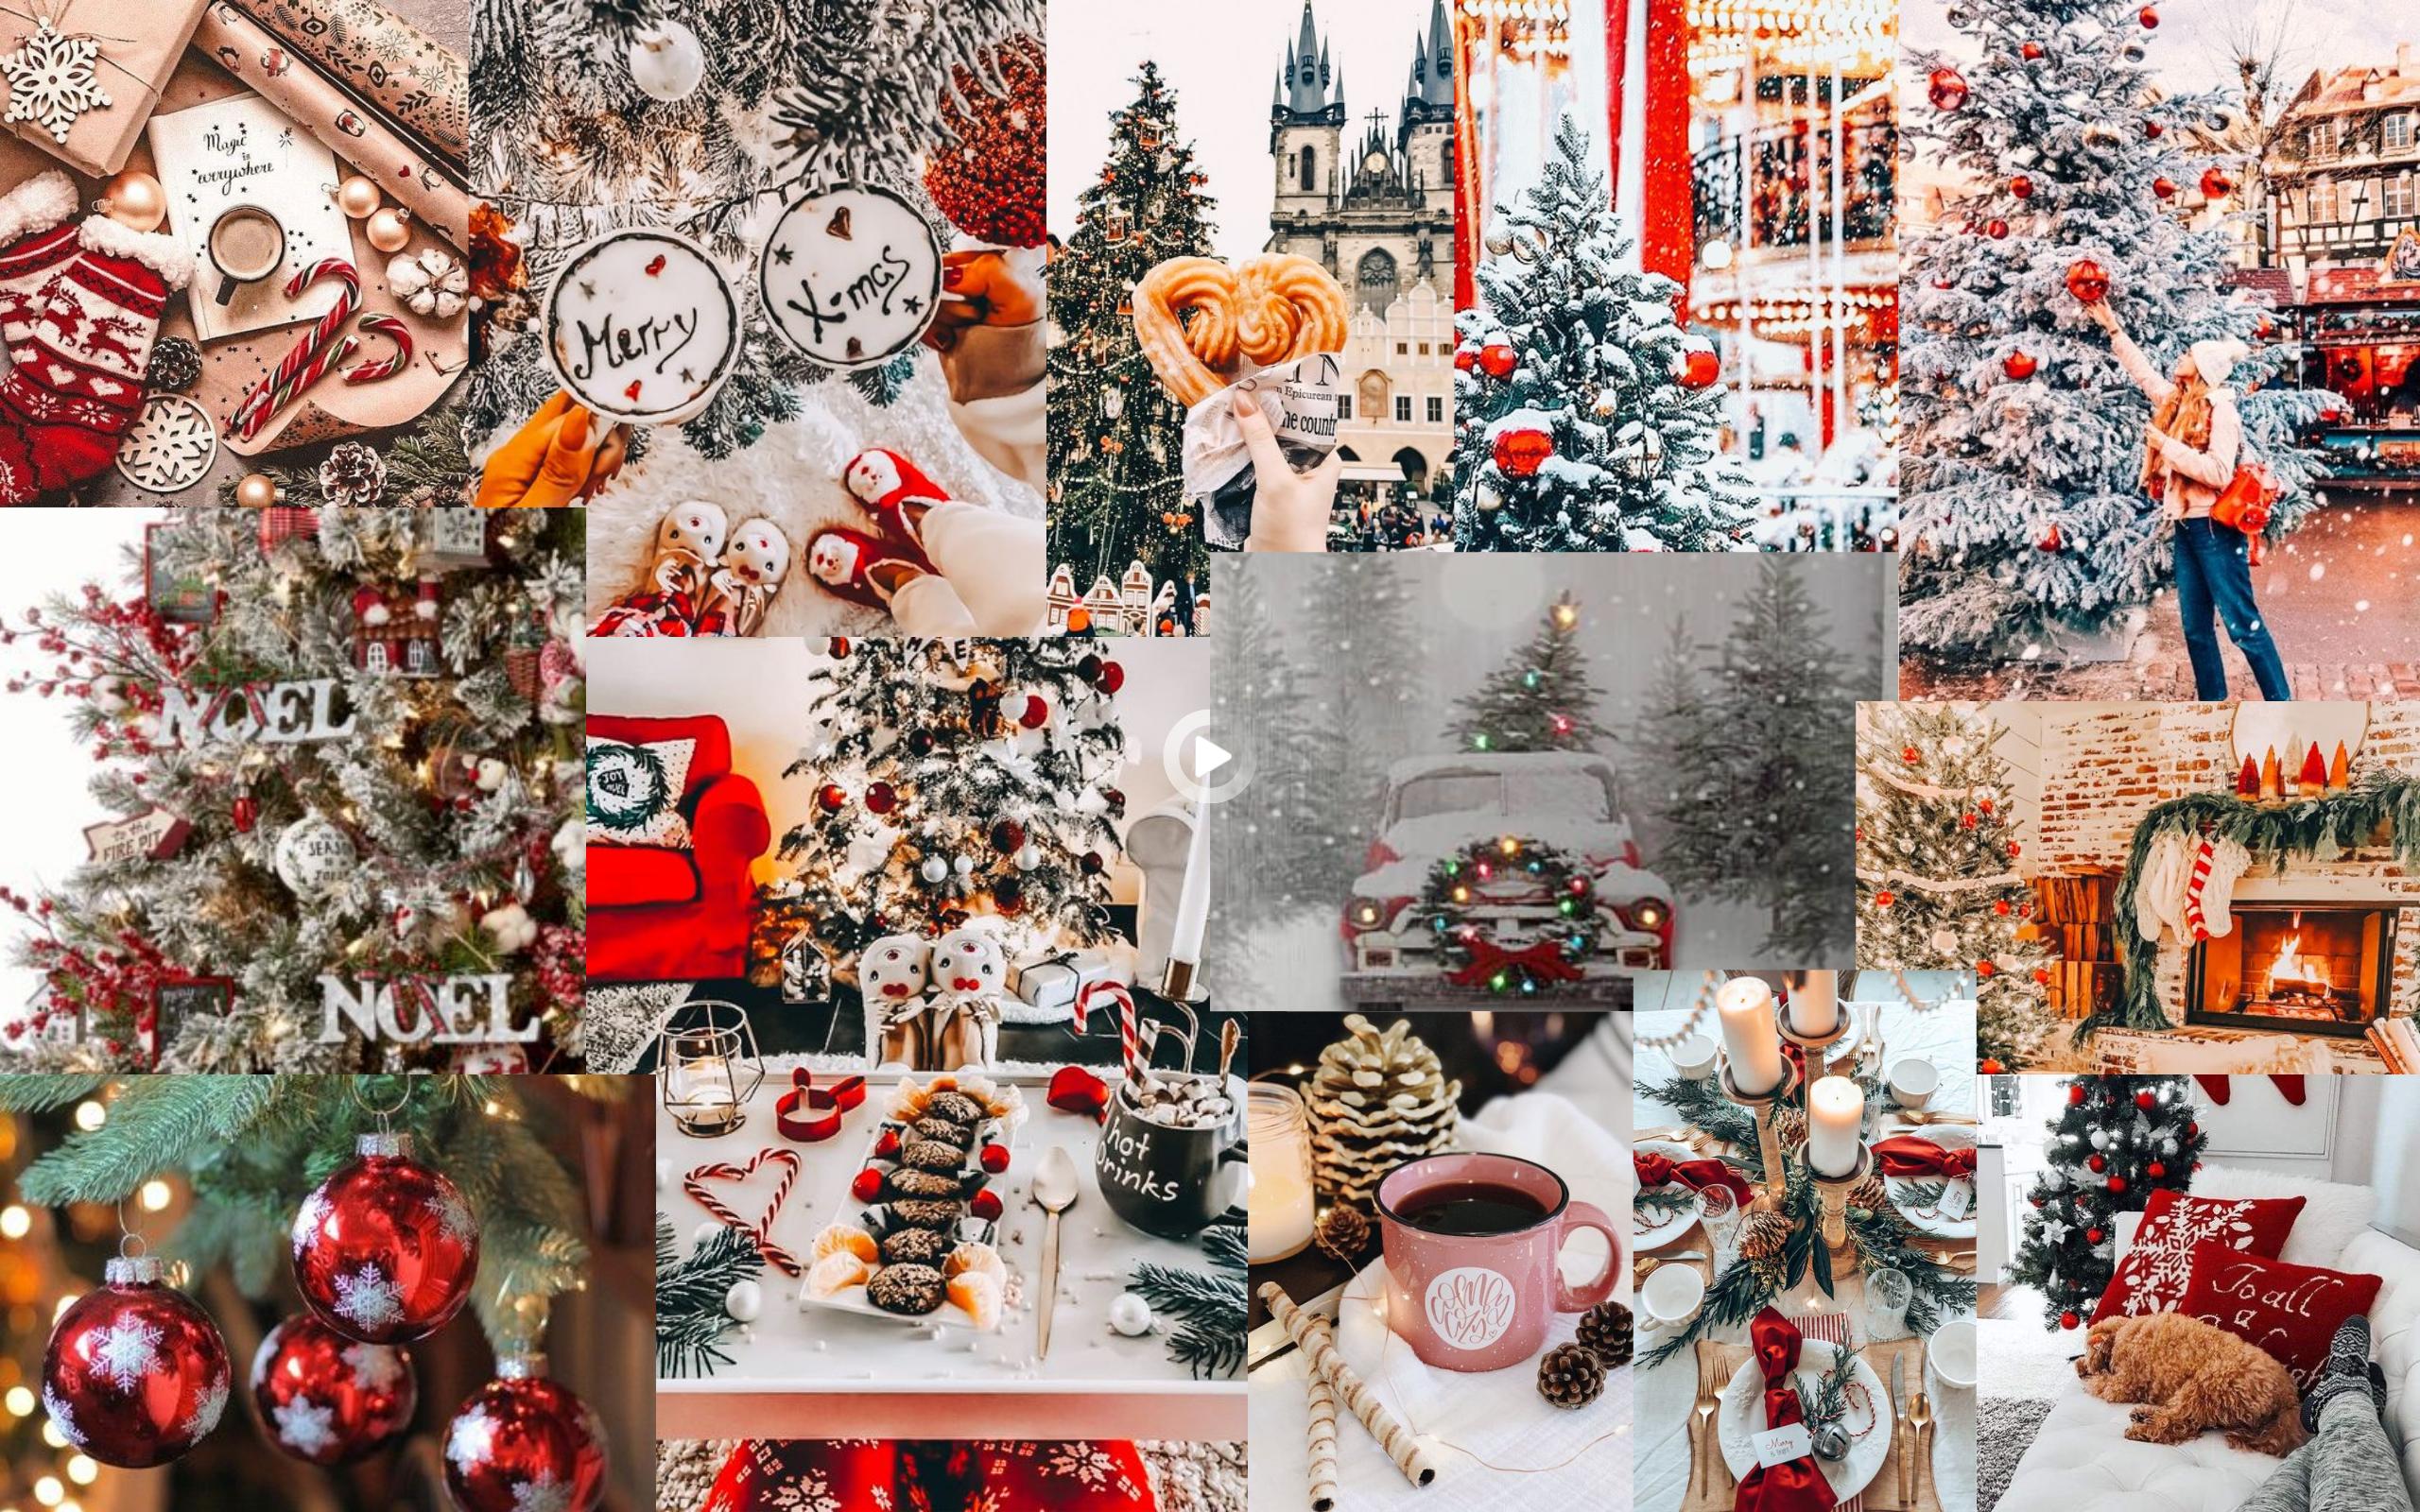 Christmas Collage For Computer Desktop Wallpaper In 2021 Wallpaper Iphone Christmas Christmas Desktop Wallpaper Cute Christmas Wallpaper